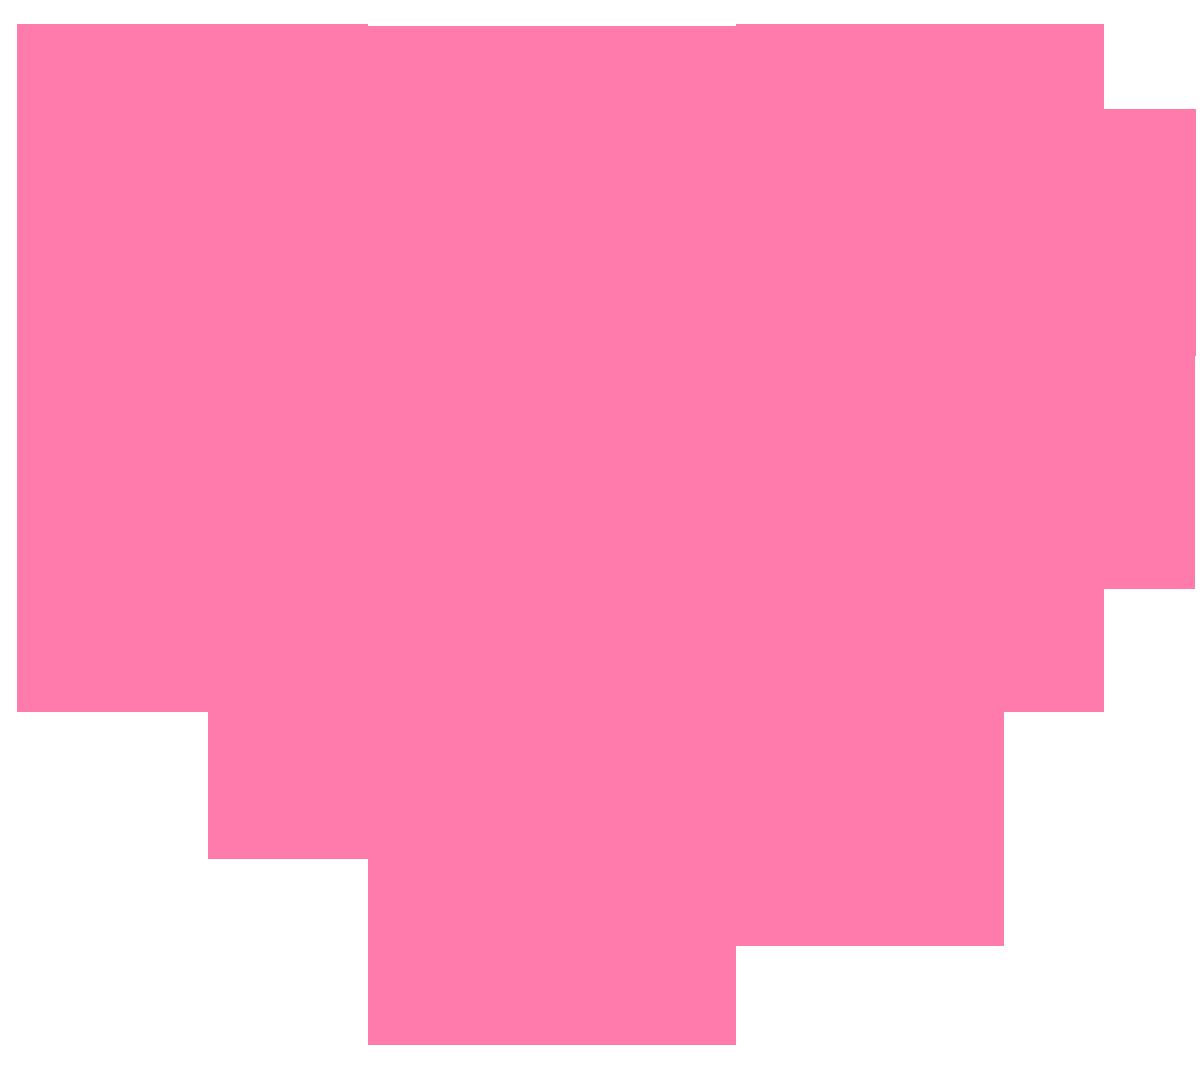 [Jeu] Quel personnage d'ACNL es-tu ? Valentines-day-heart-clip-art-171592